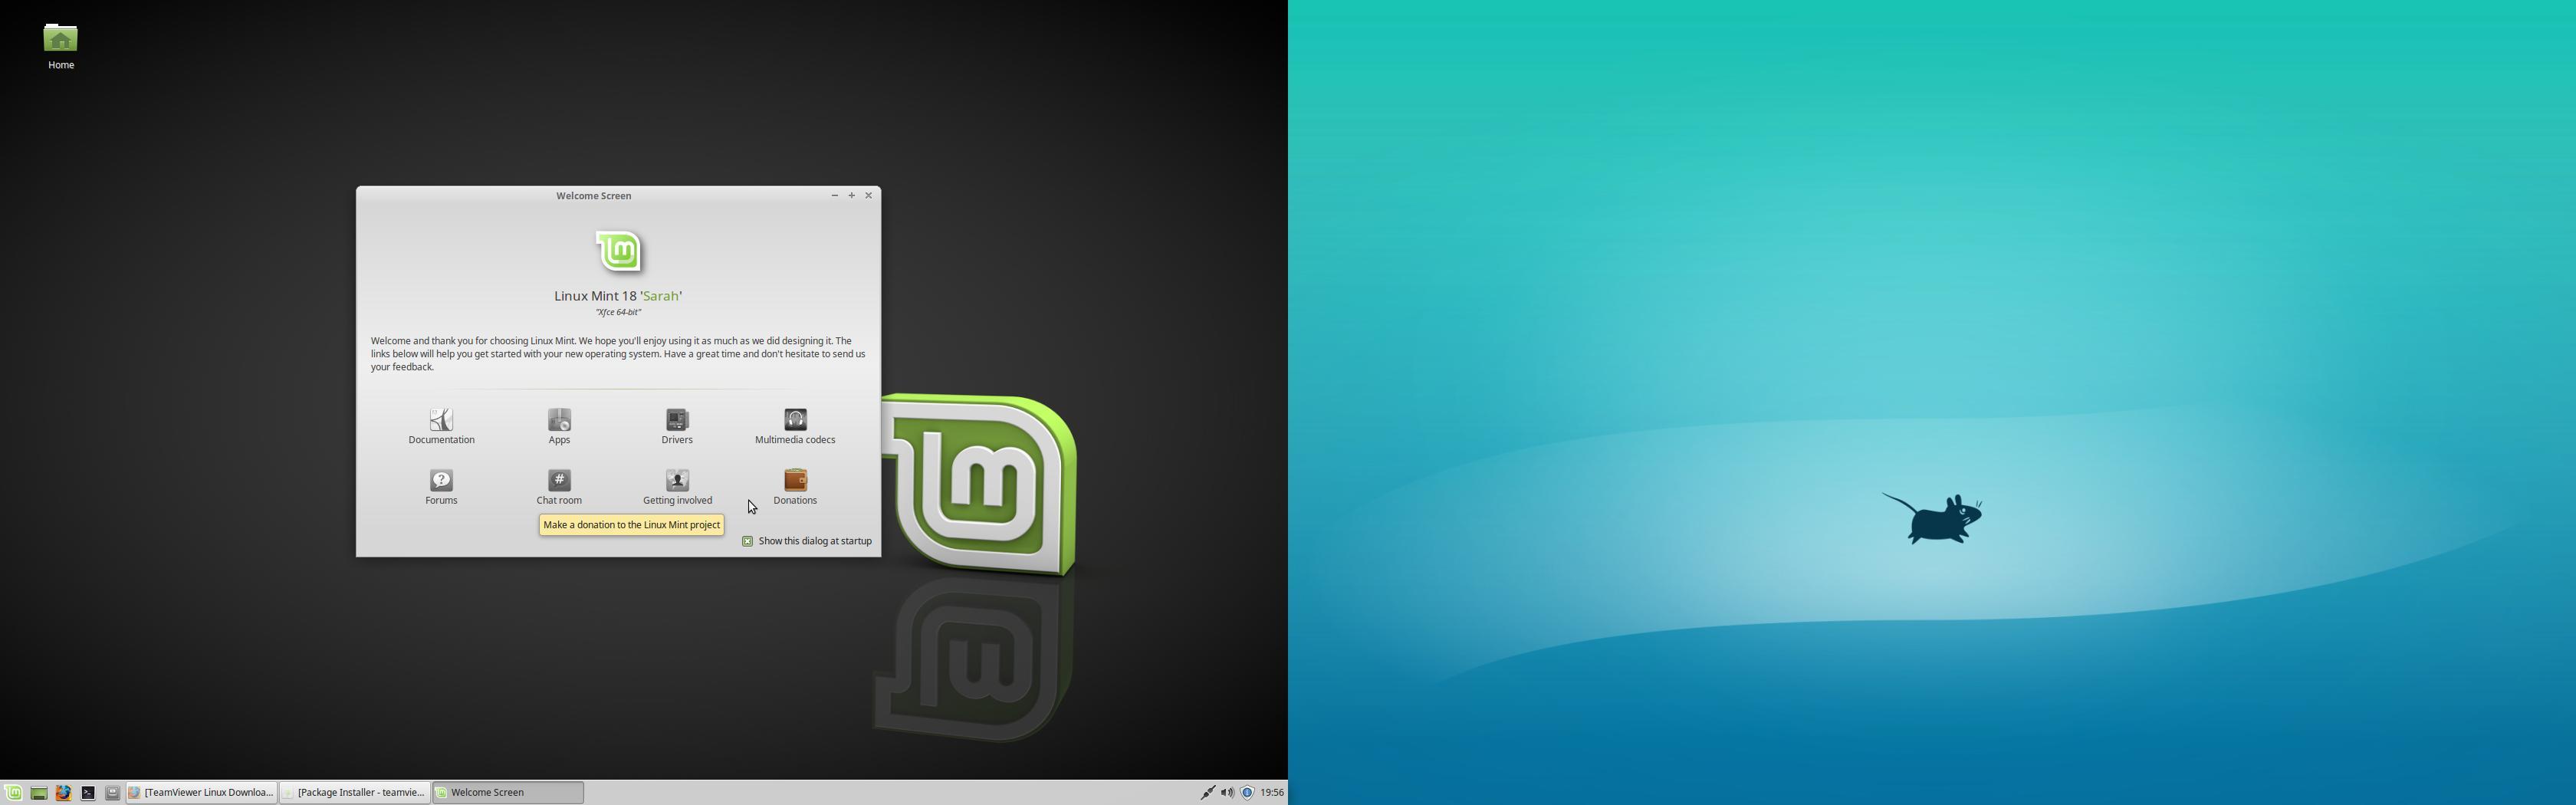 Ultimate-Linux-Mint-18-Xfce/README md at master · erikdubois